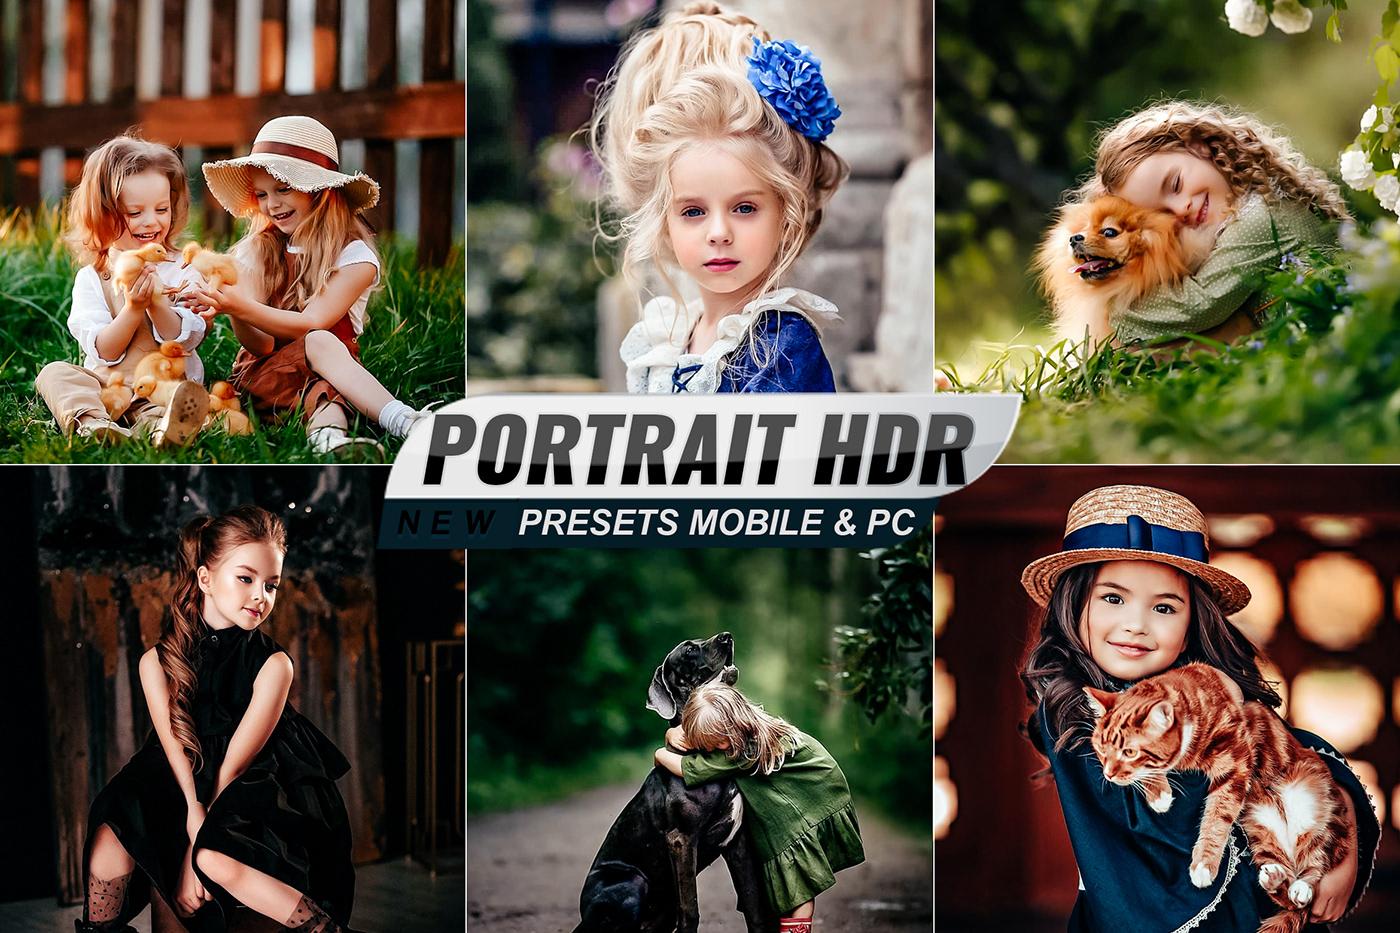 action fashion hdr hdr mobile Hdr Photoshop hdr preset mobile portrait